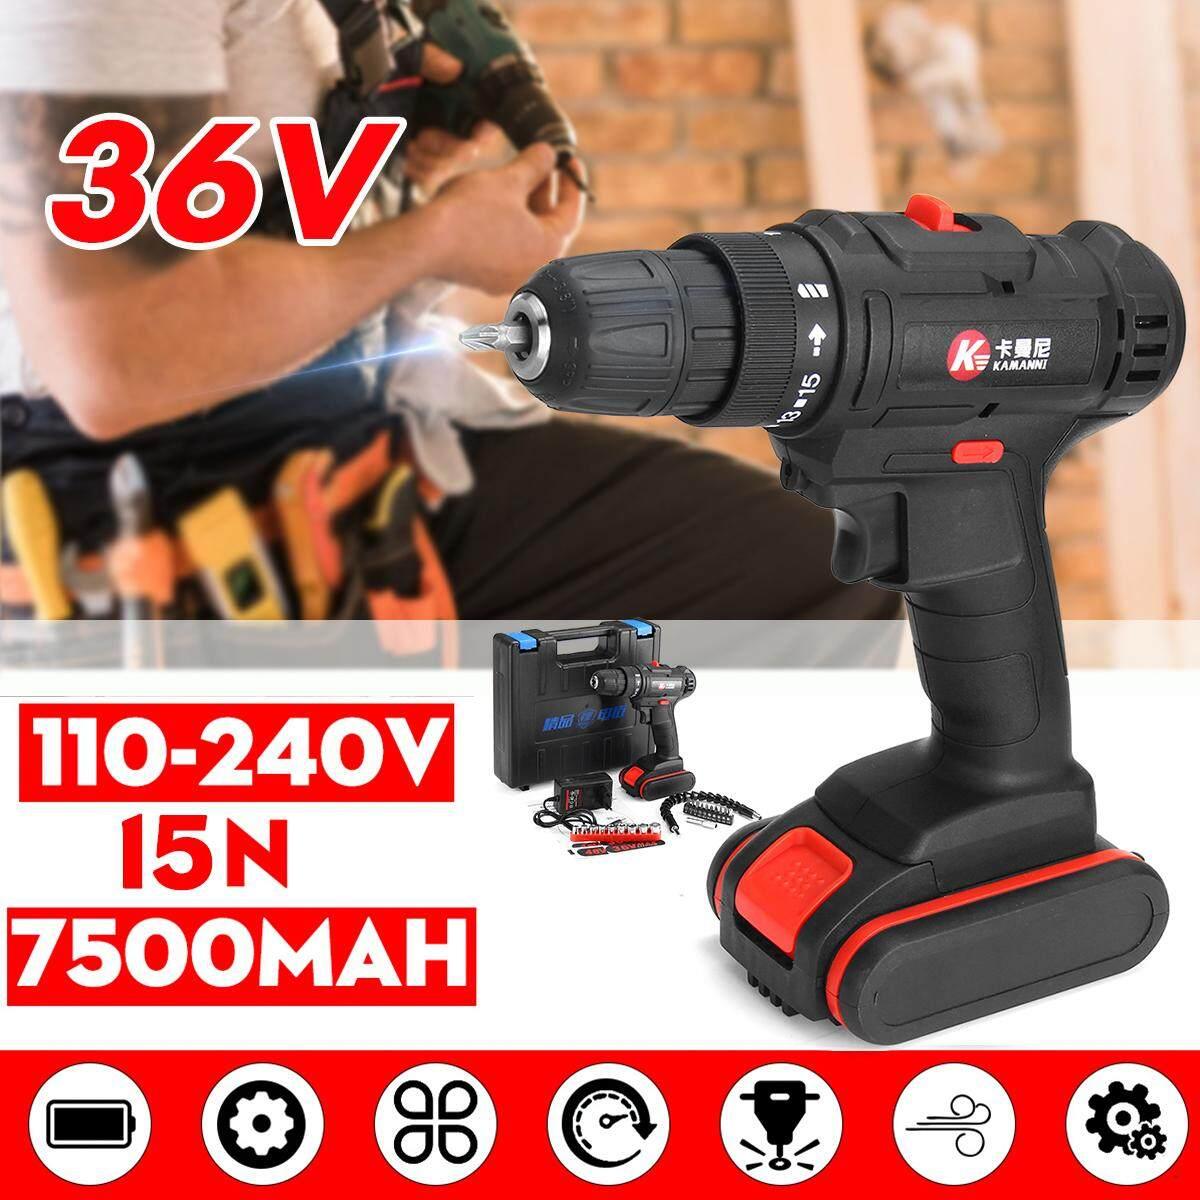 36V 7500mAh Cordless Electric Drill/Driver 2 Speed LED Lighting 1 x Ba*tery Tool-36V